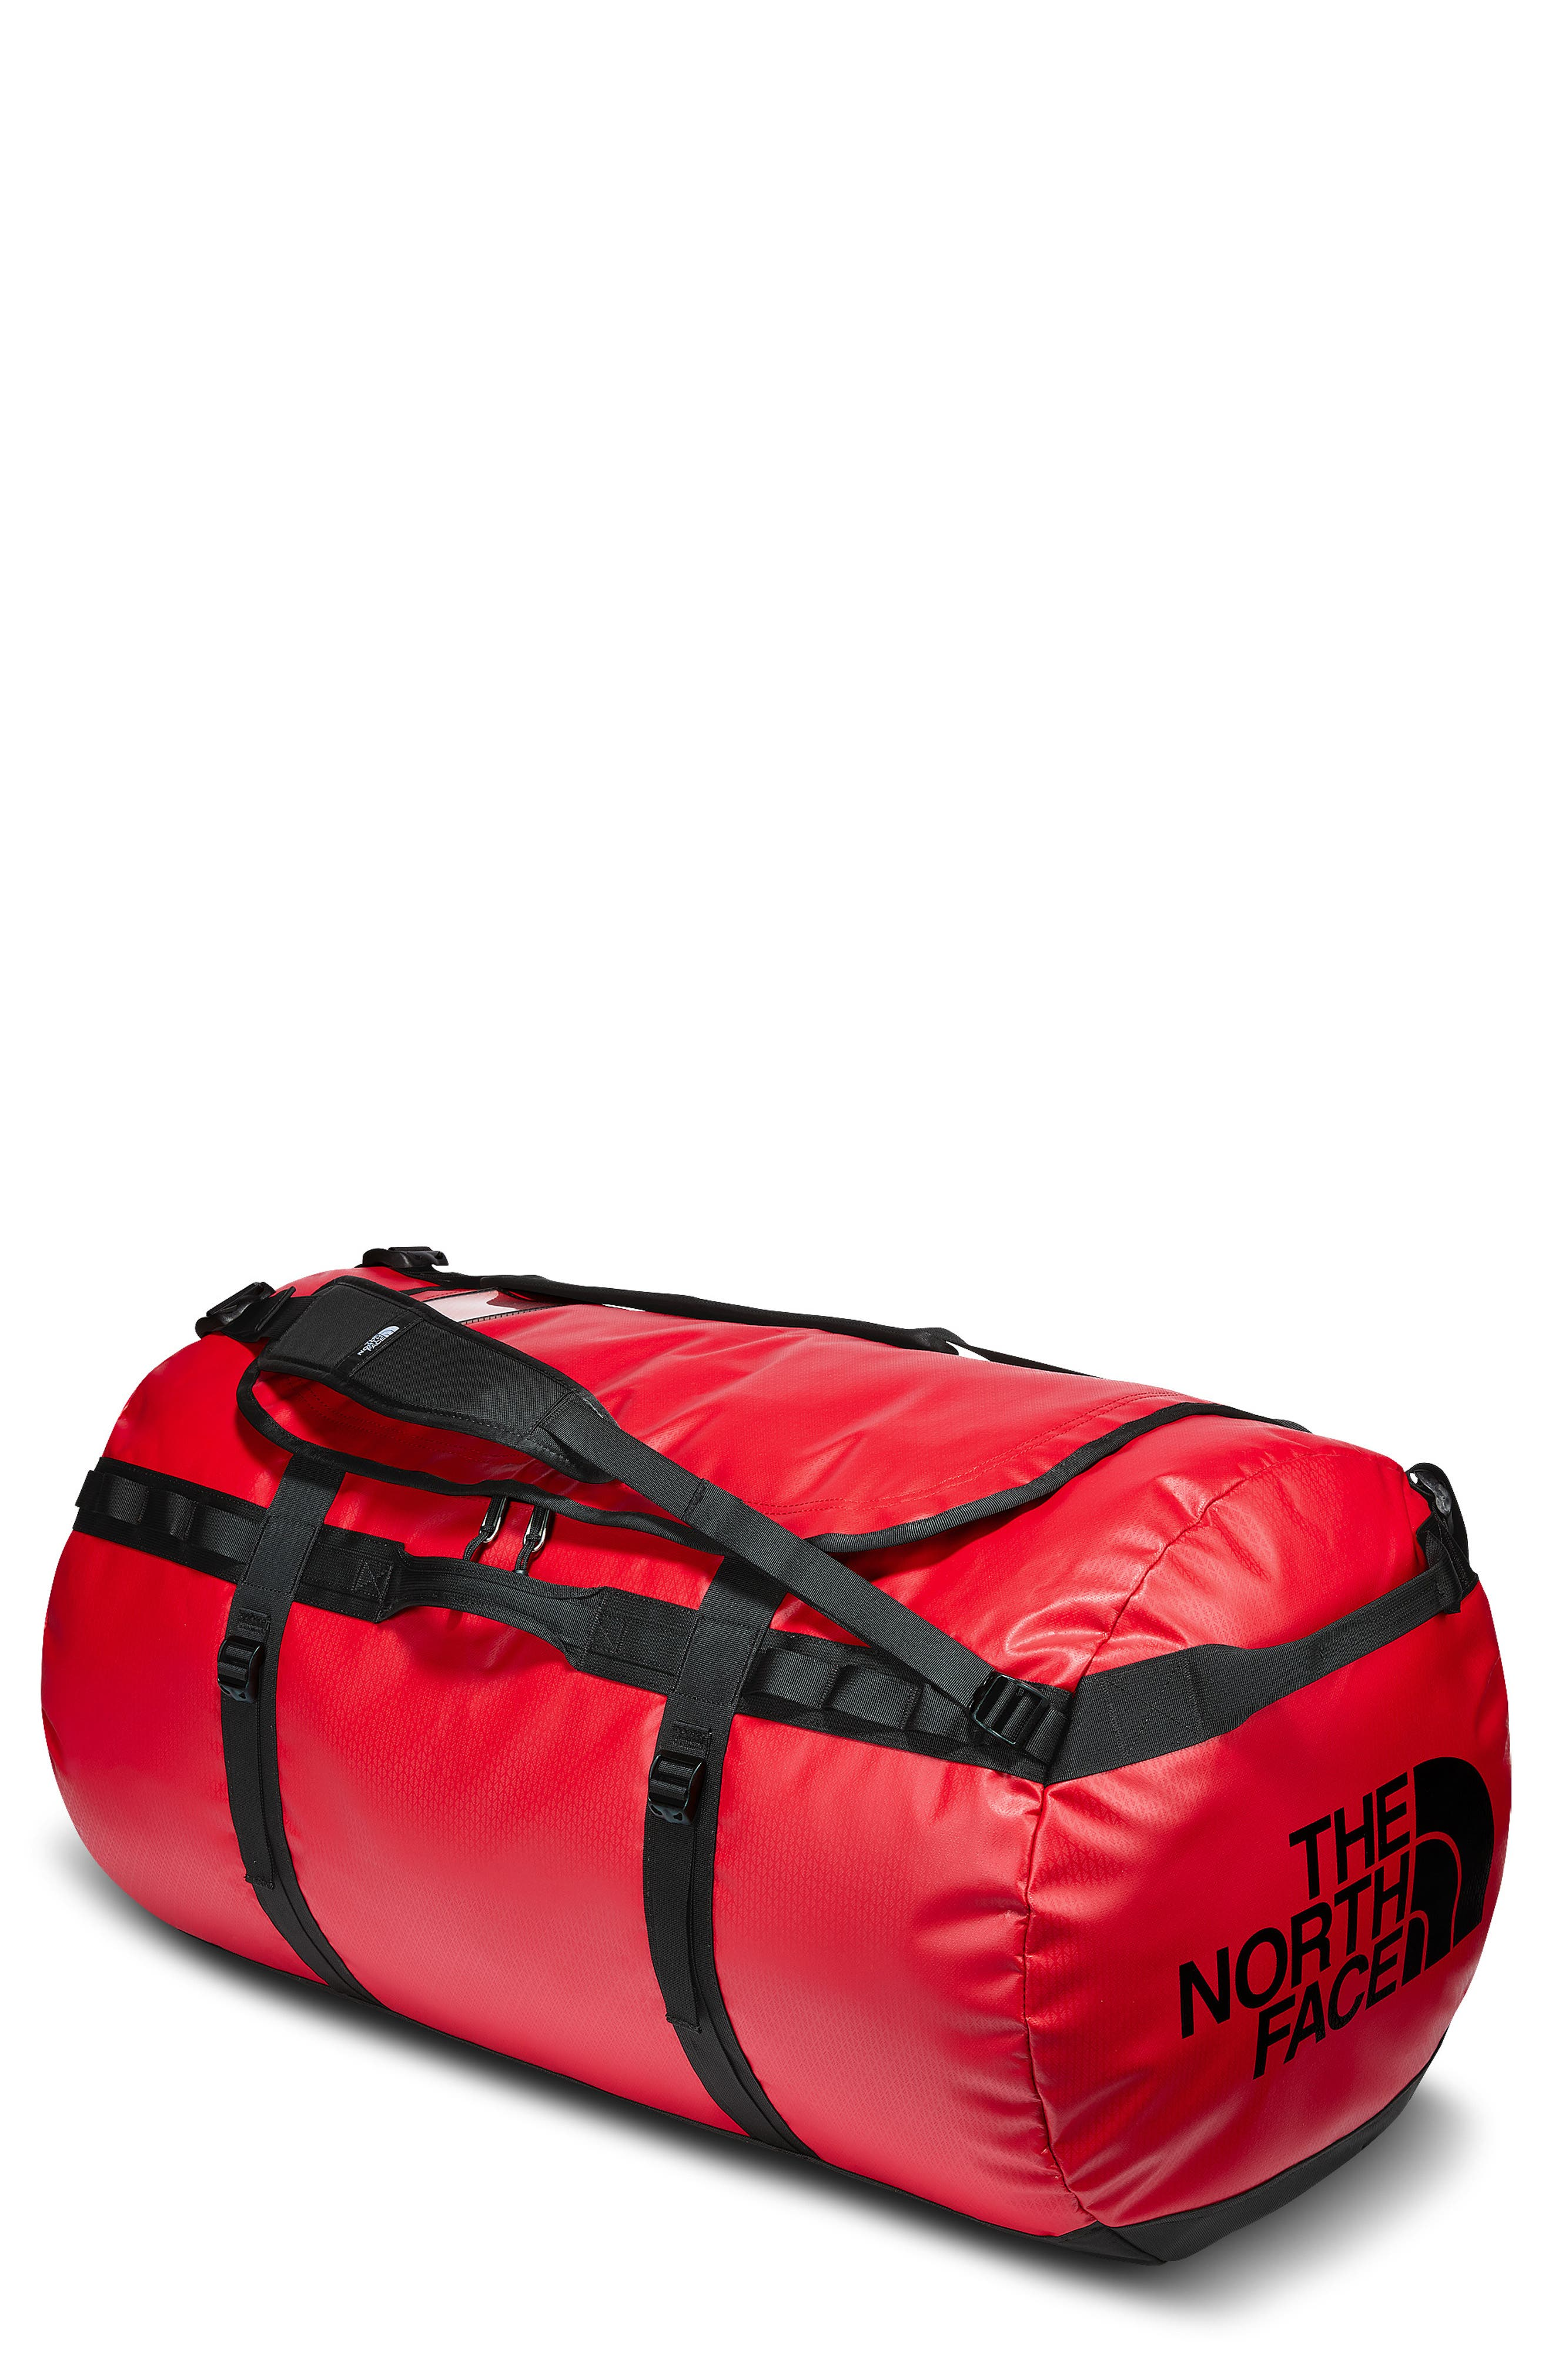 Base Camp XXL Duffel Bag,                             Main thumbnail 2, color,